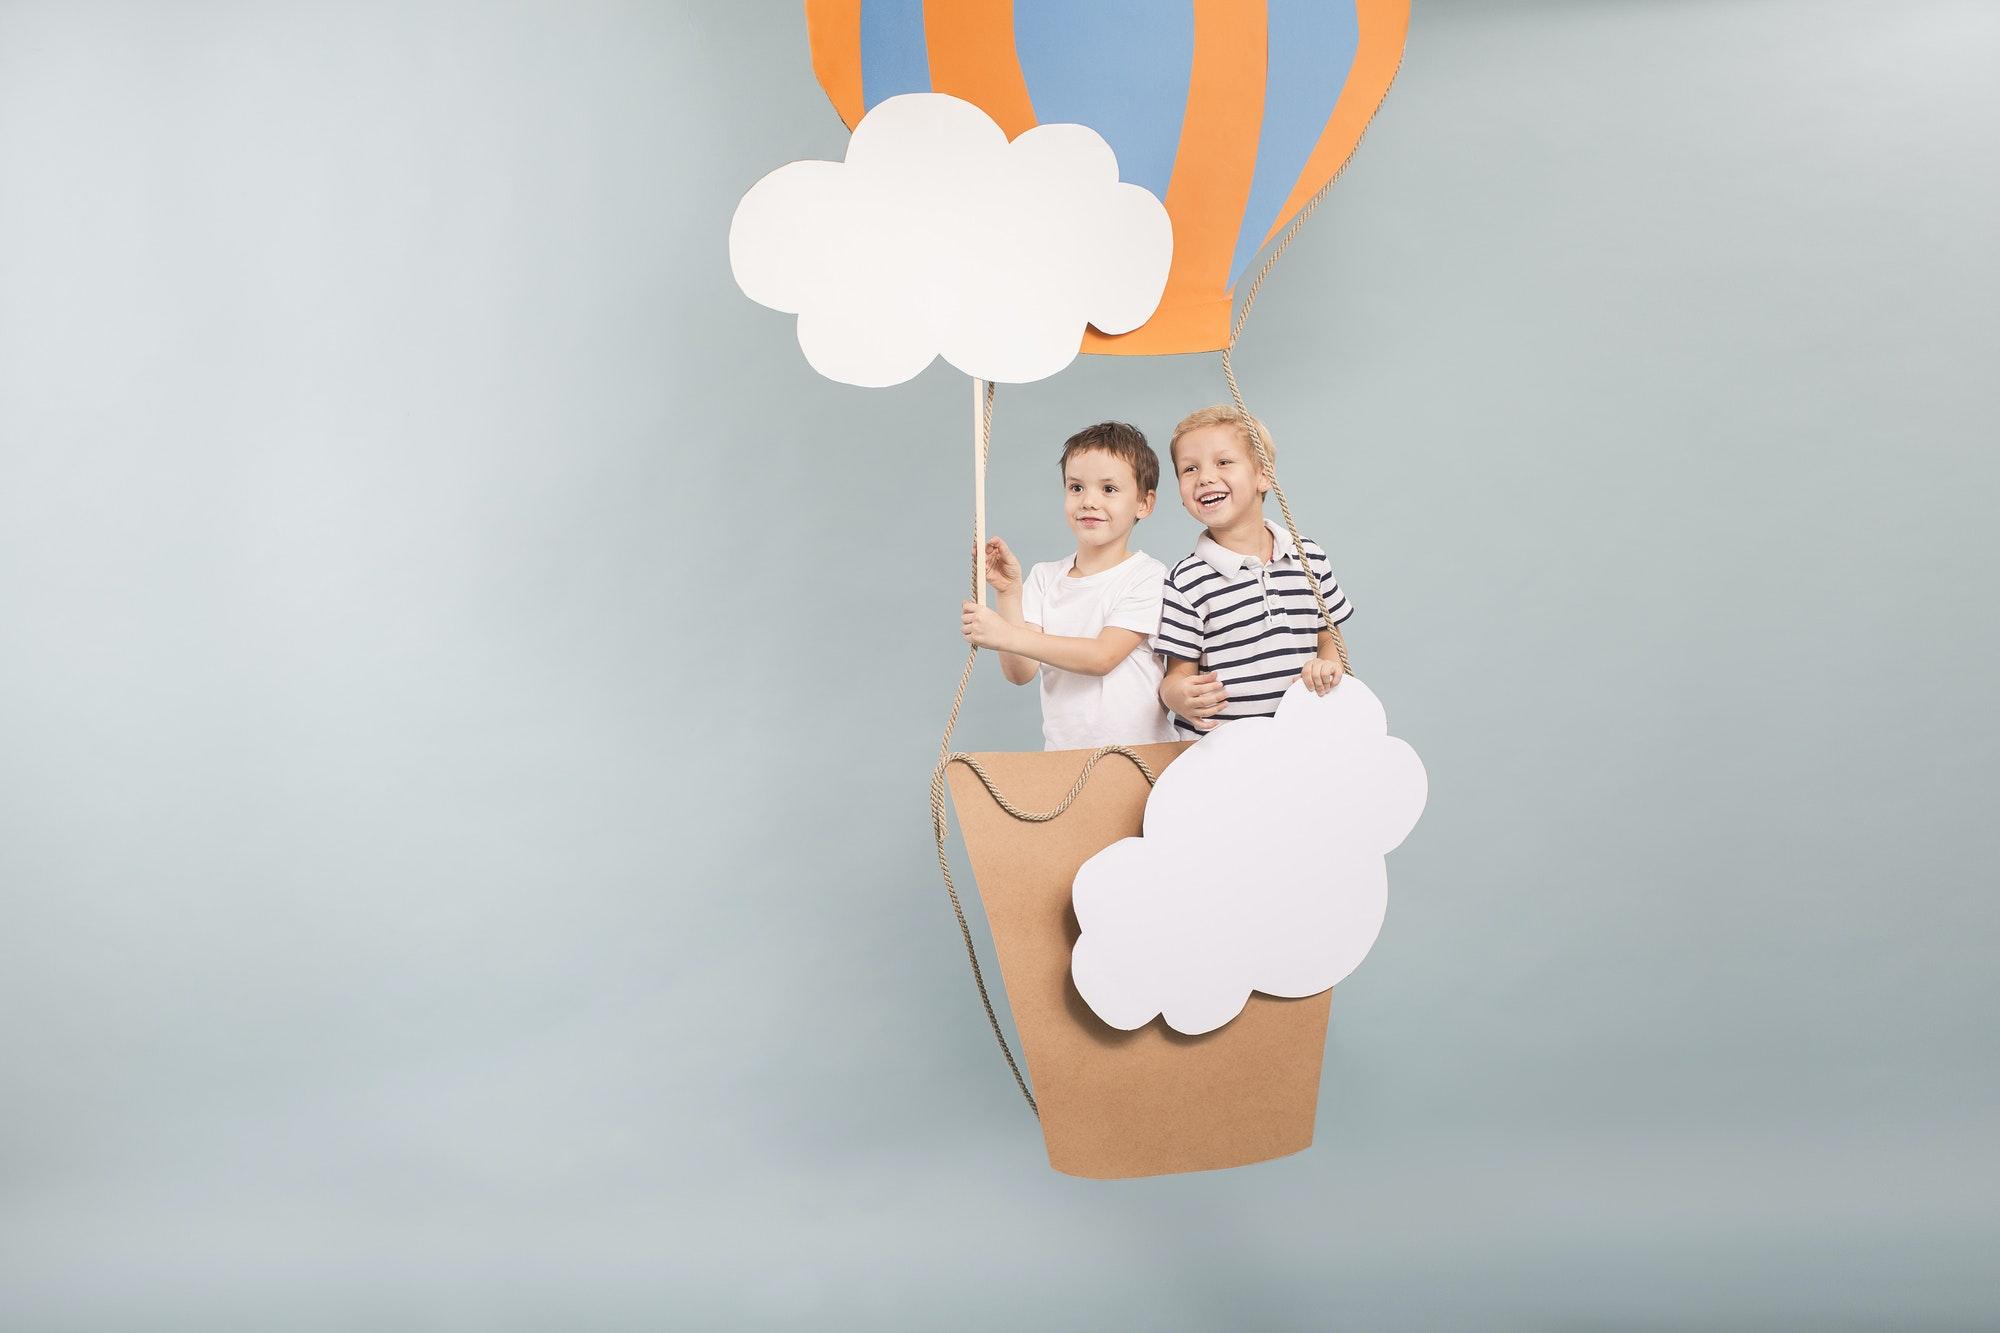 Boys flying in baloon